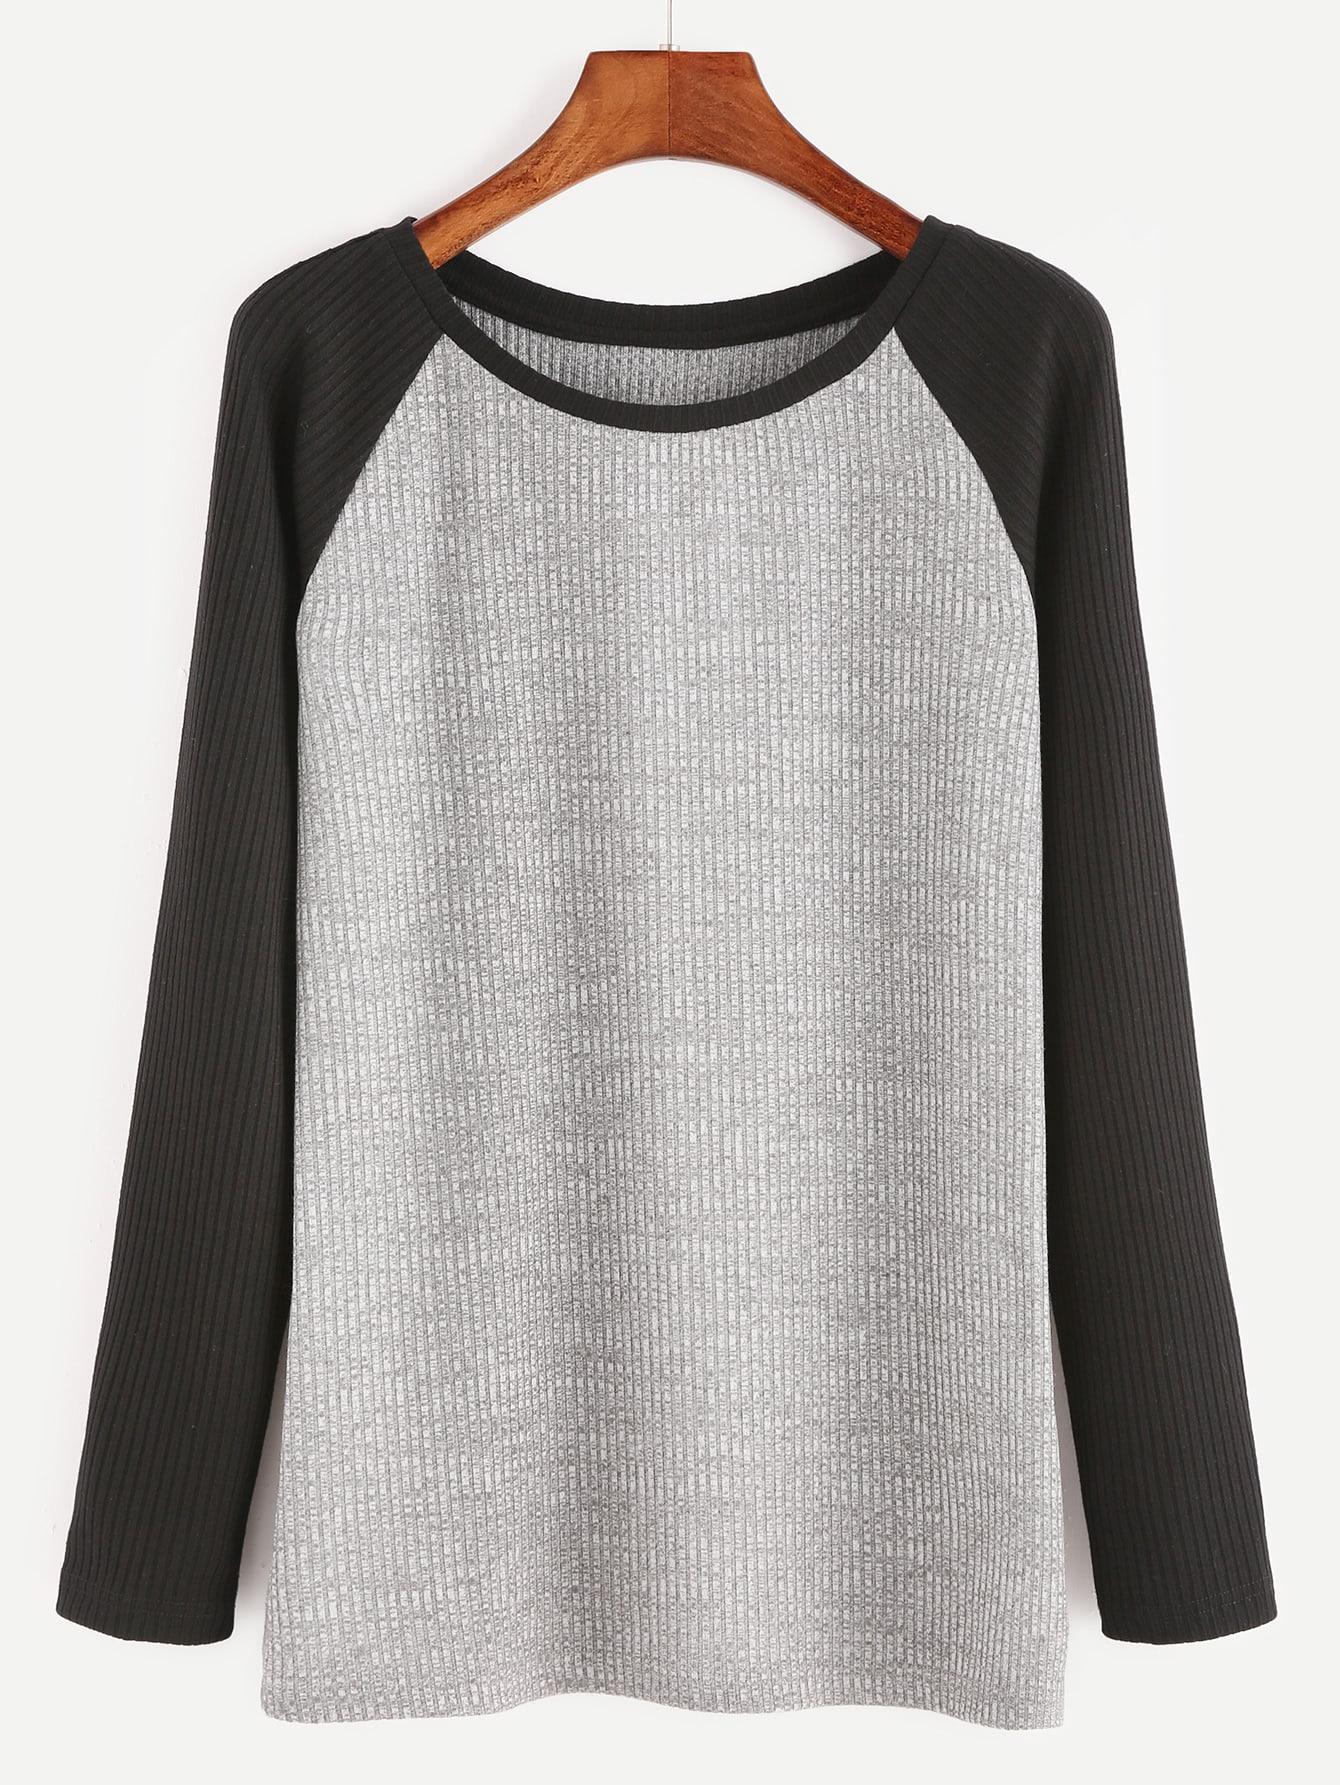 Heather Grey Contrast Raglan Sleeve Ribbed Knit T-shirt tee161111702